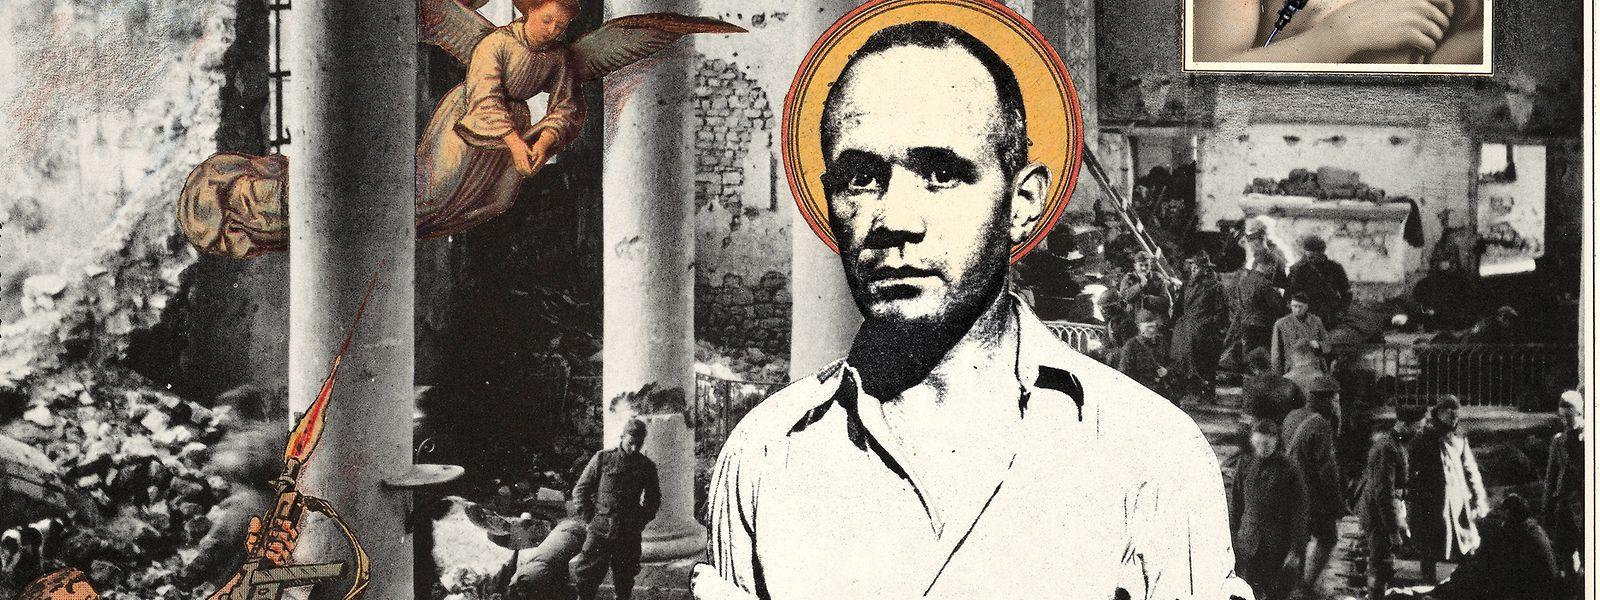 David Wojnarowicz:  «Untitled» (Genet after Brassaï) 1979 (détail).